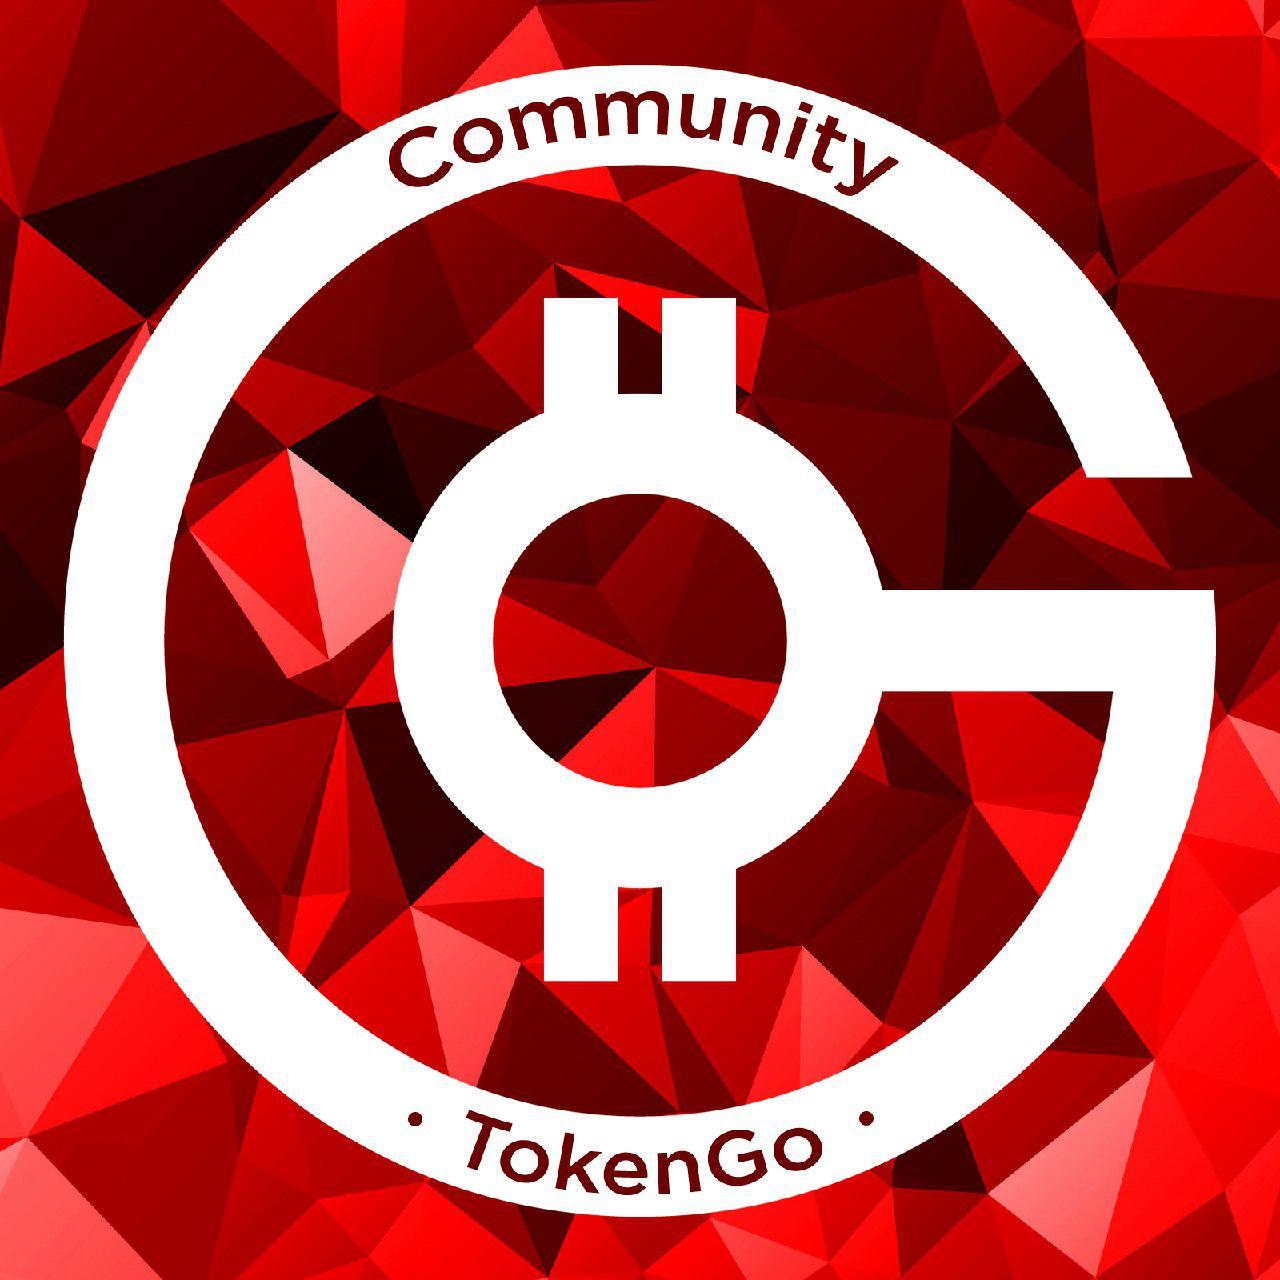 TokenGo_Community10.jpg